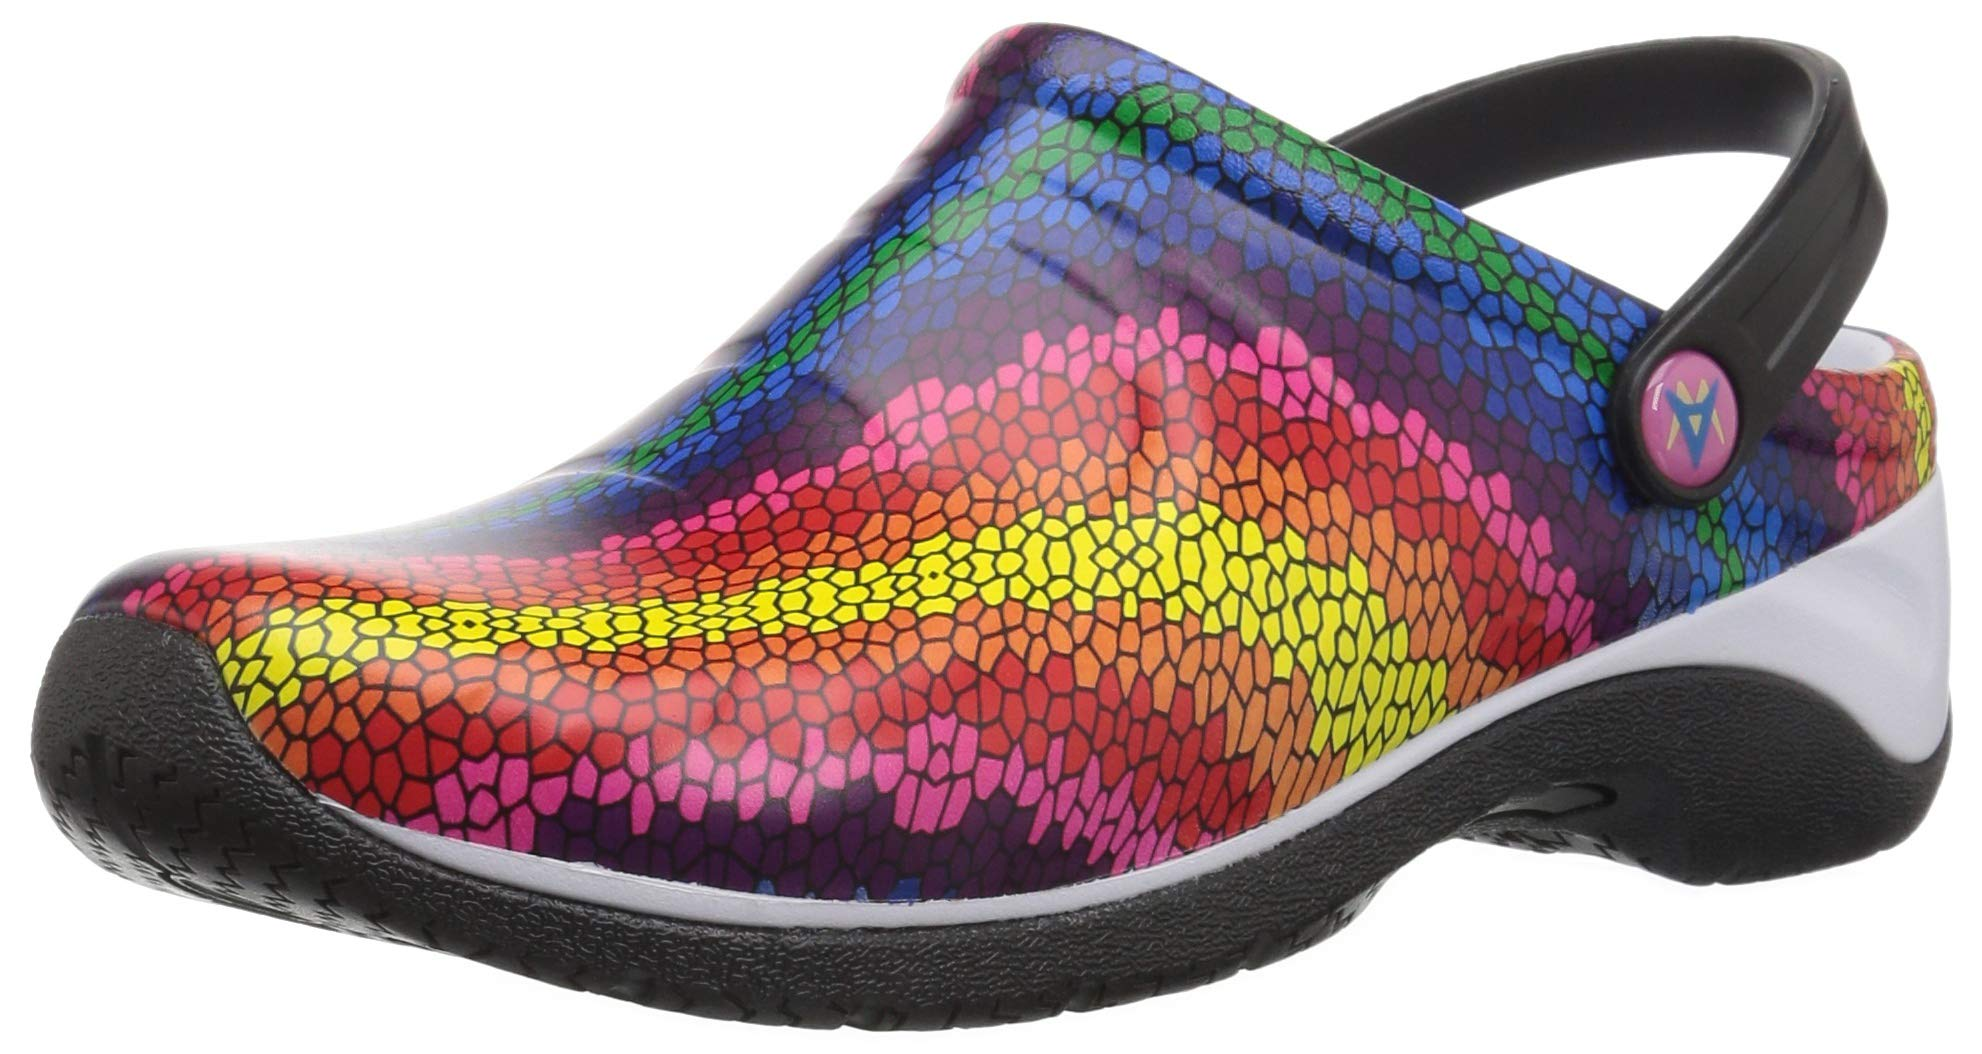 Anywear Women's Zone Medical Professional Shoe, Stained Glass, White, Black, 5 Medium US